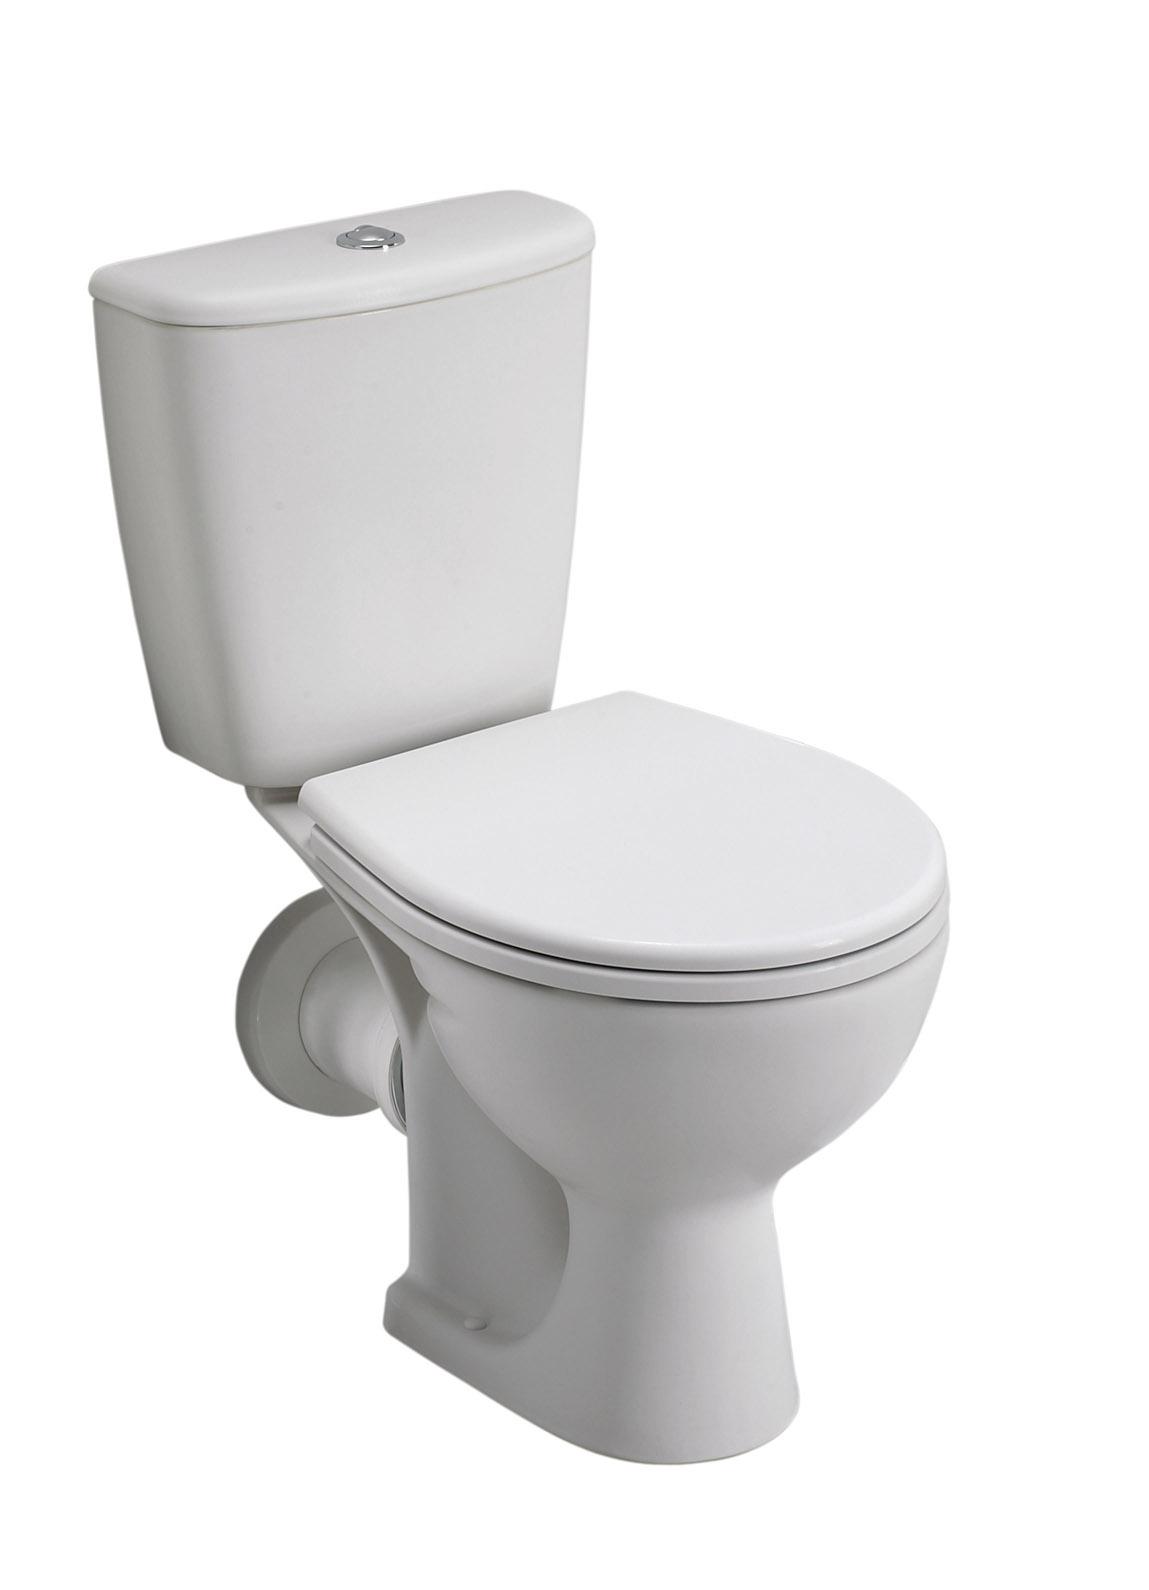 wc/klozety KOLO Rekord K99004 WC kombi